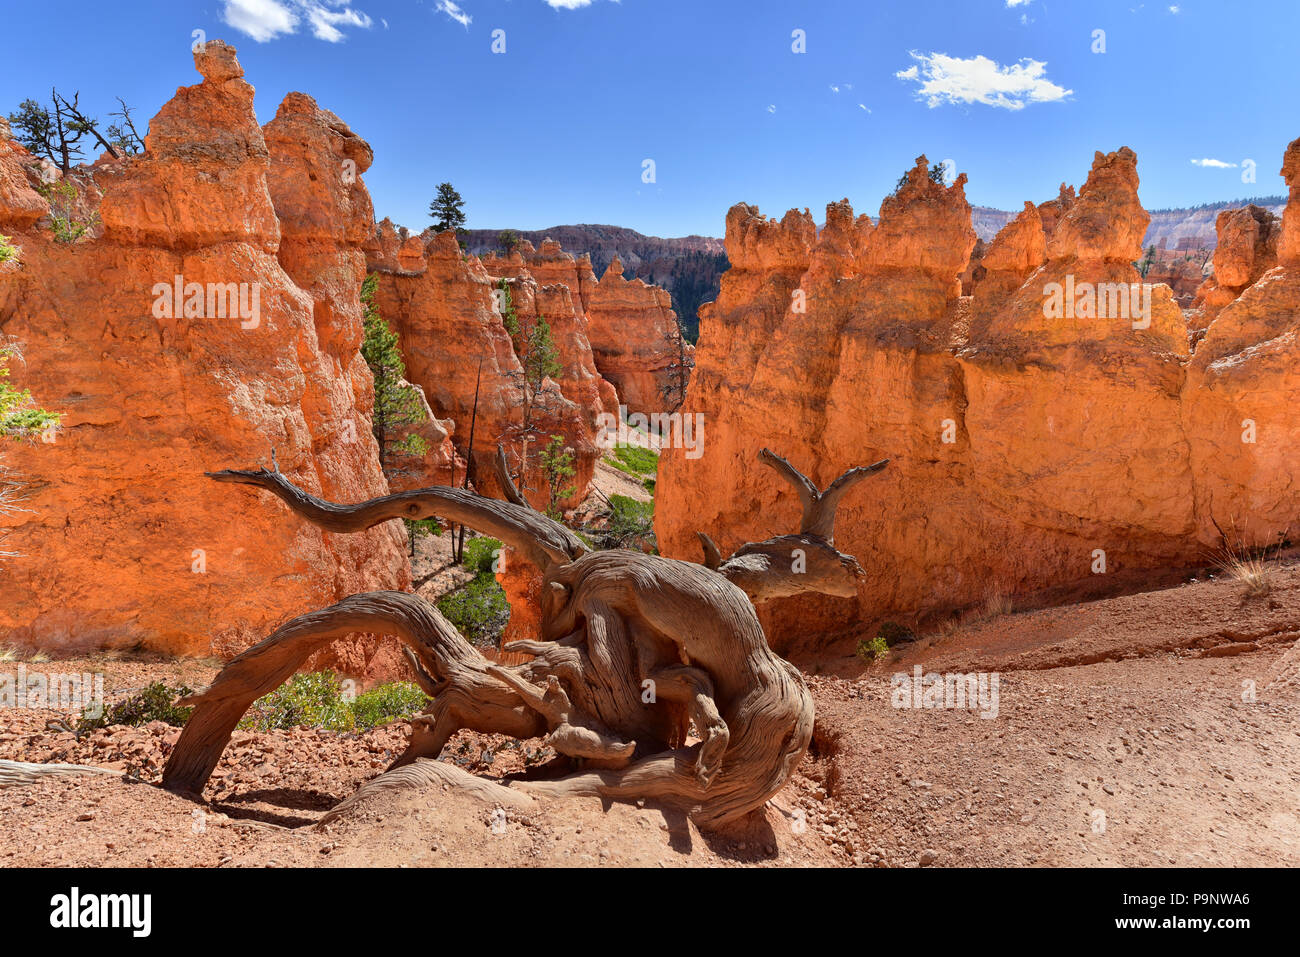 Alte verwitterte Wacholder Baumstumpf entlang der Strecke, in der hoodoo Canyon, dem Bryce Canyon National Park, Utah Stockbild